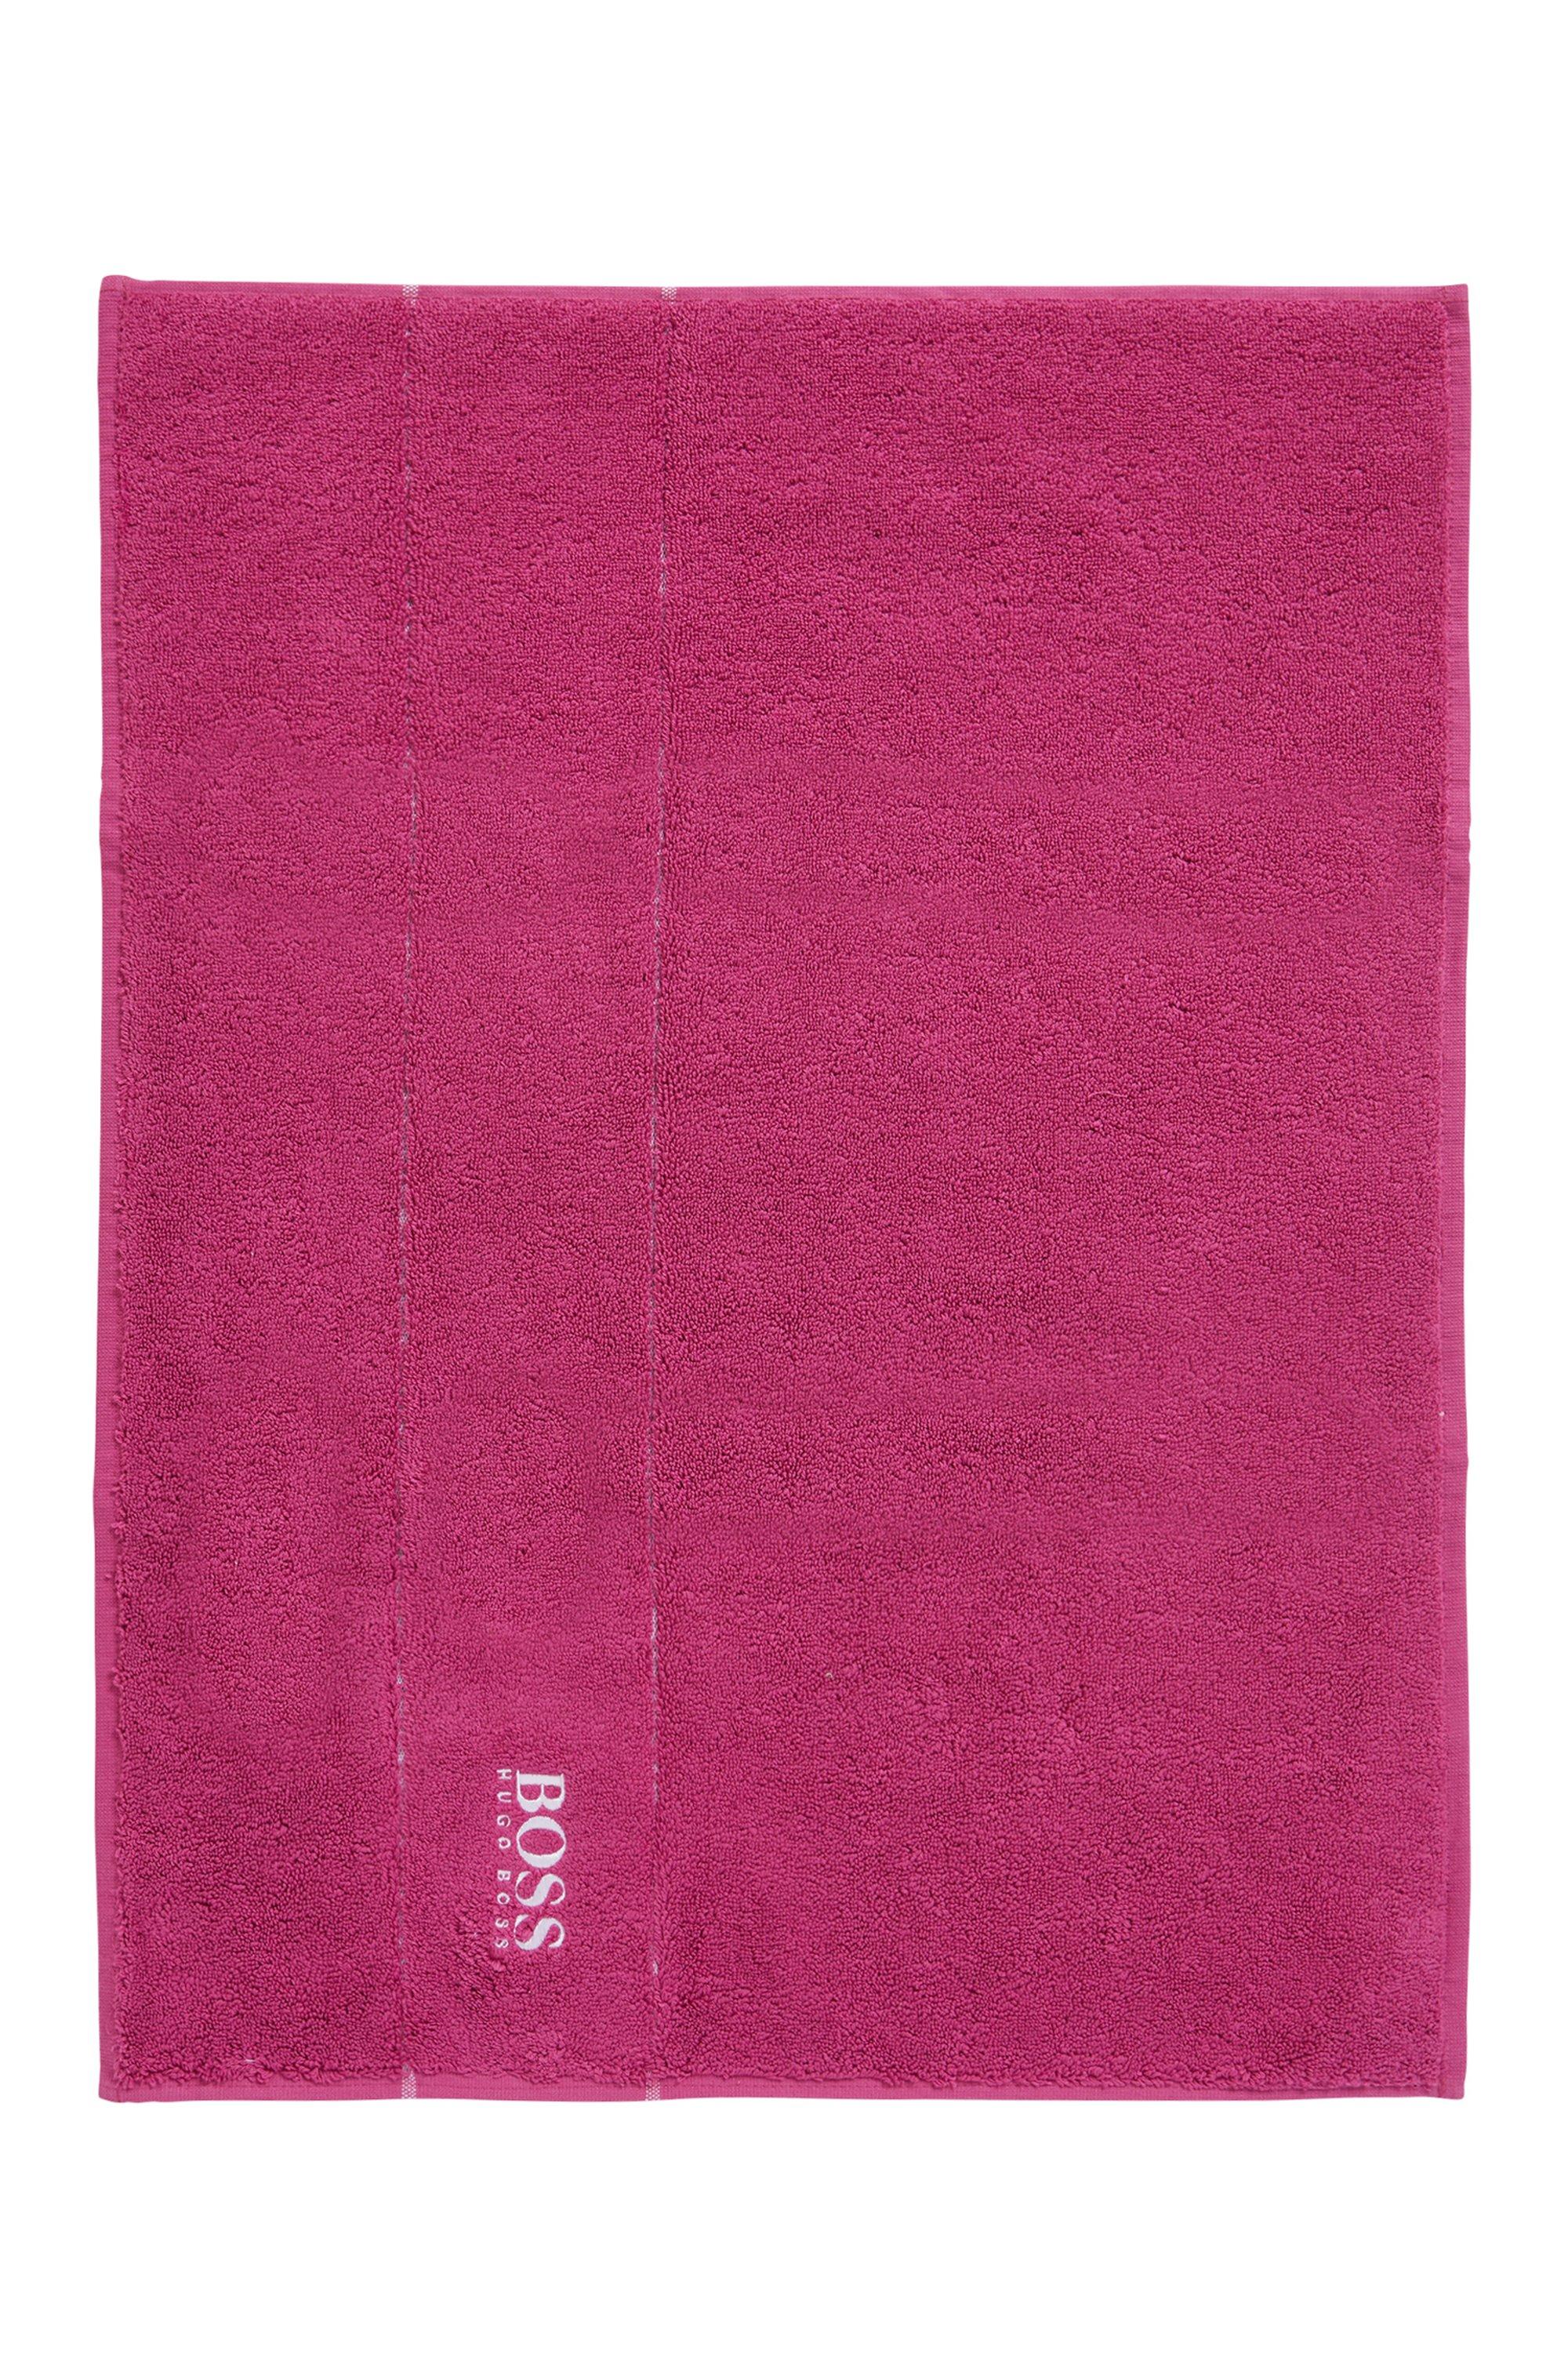 Finest Egyptian cotton bath mat with logo border